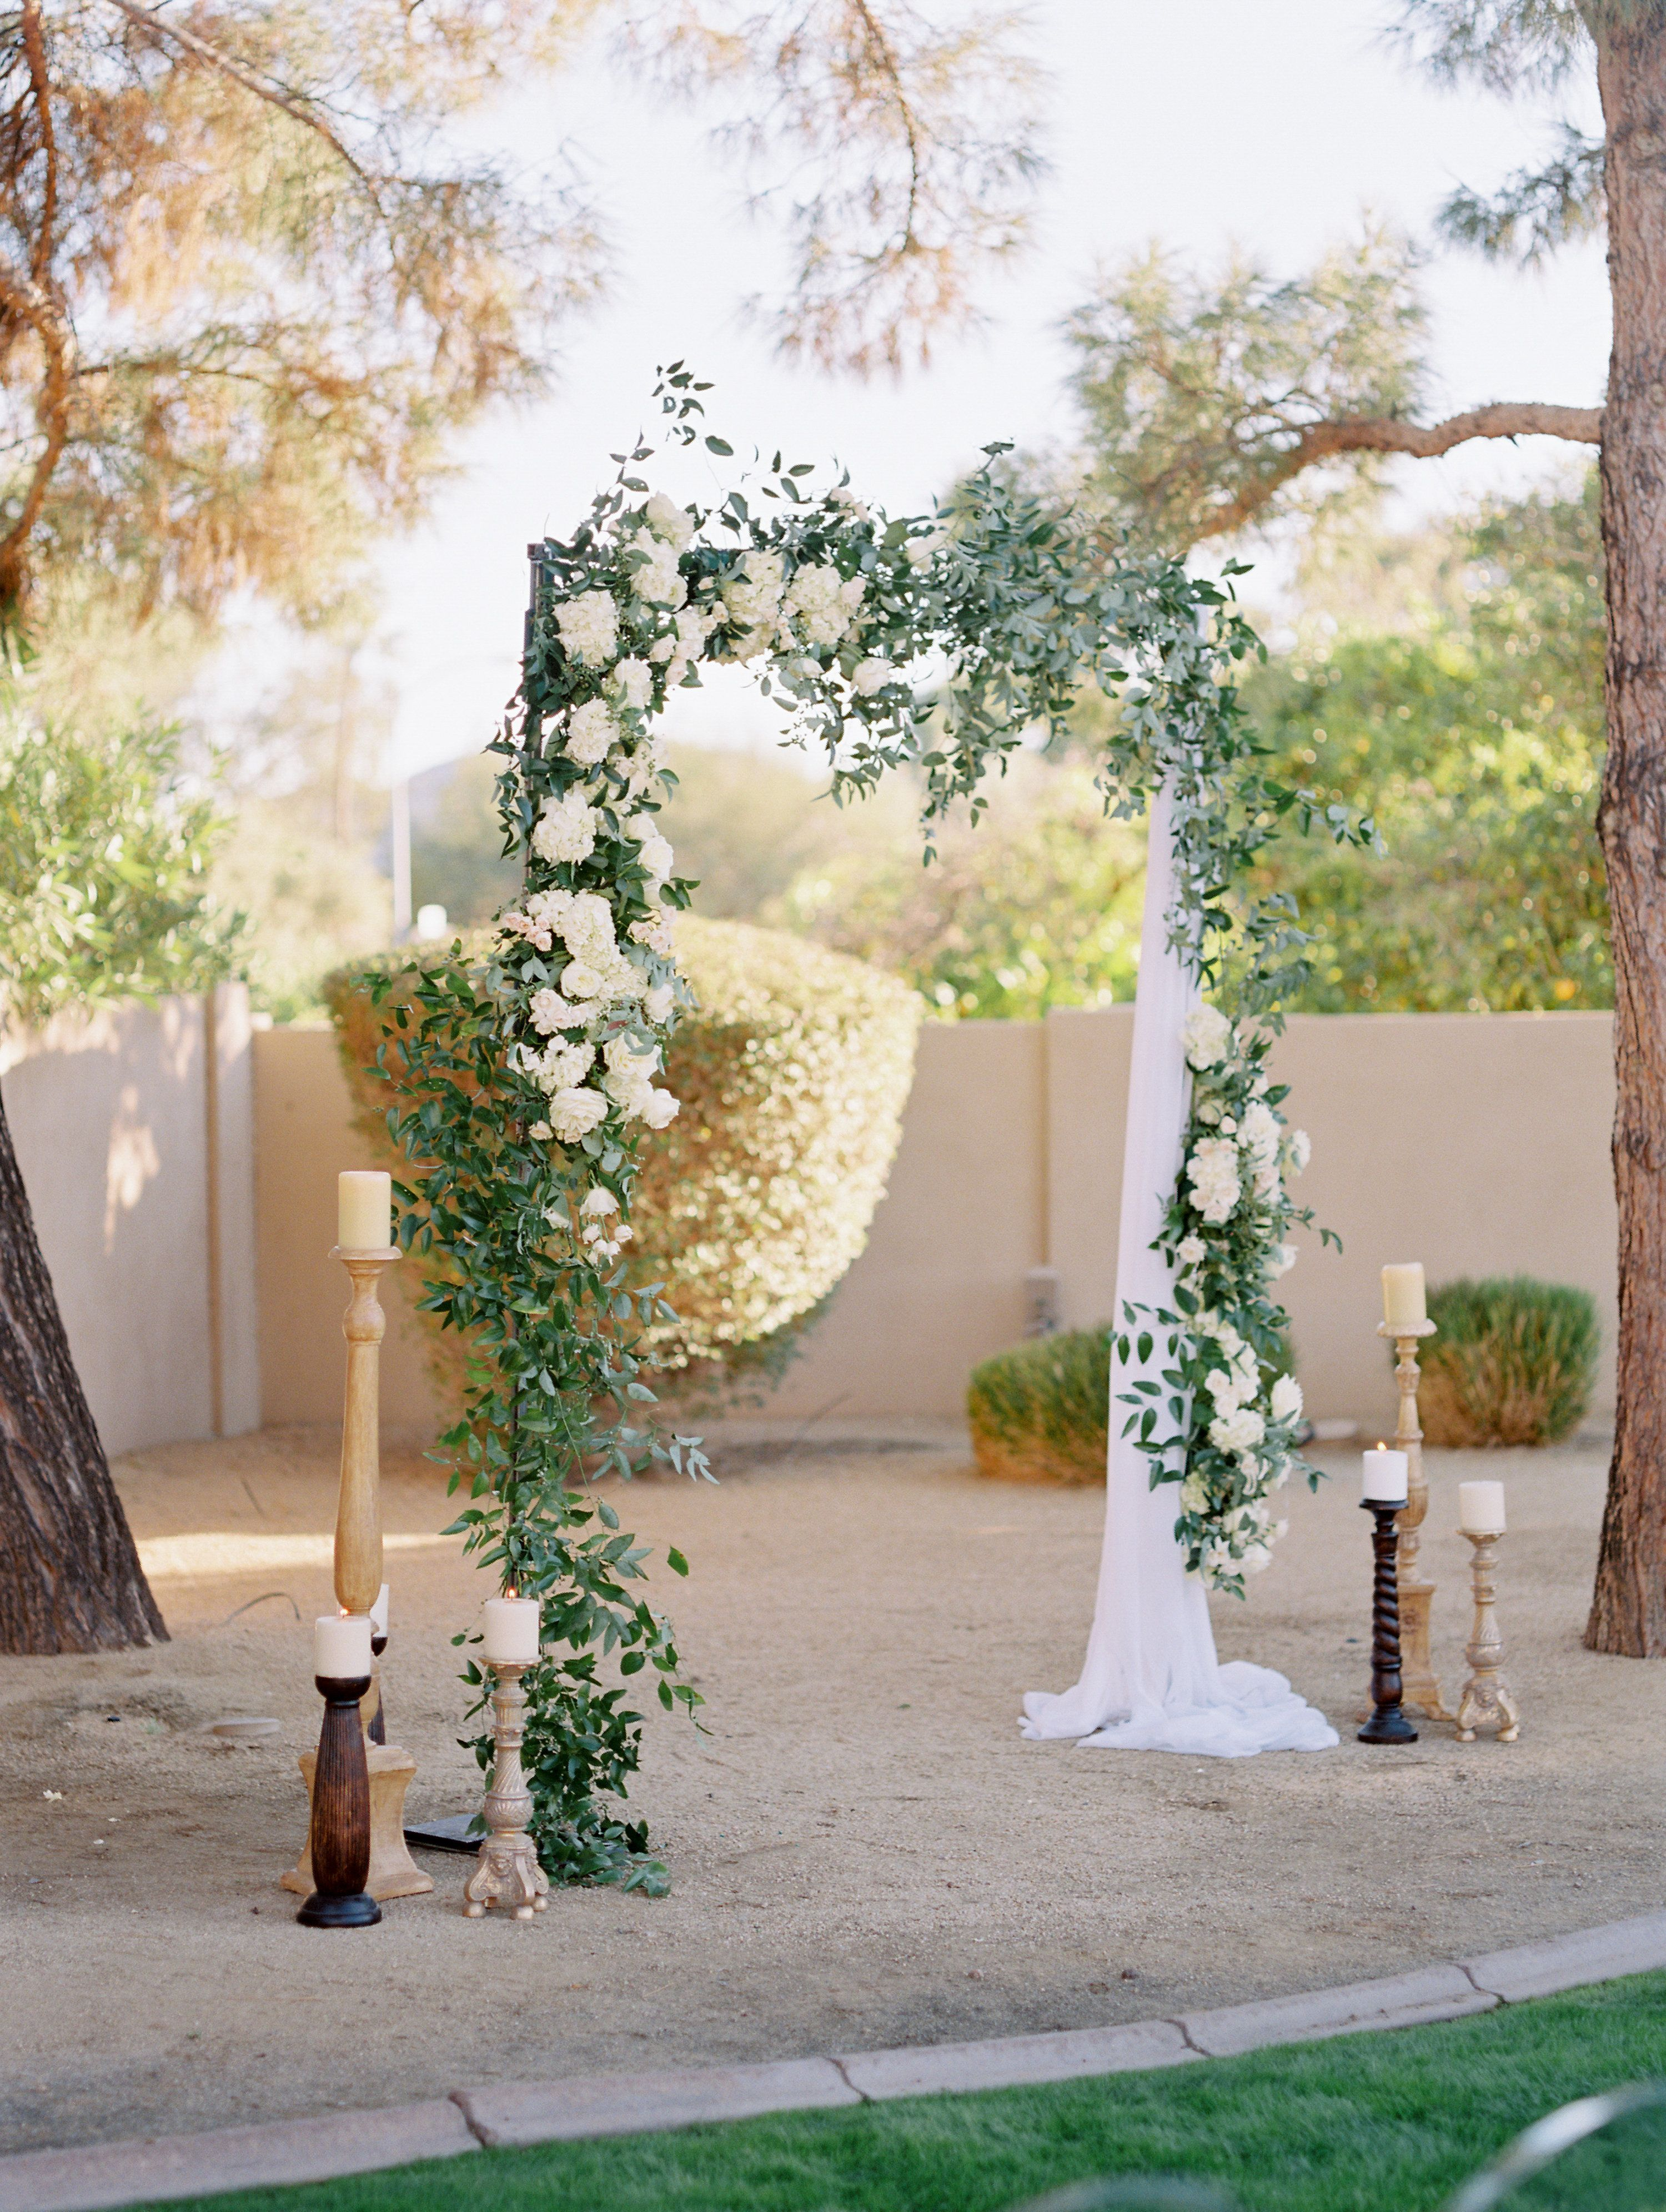 Wedding decorations dusty blue december 2018 The Most Elegant Desert Garden Wedding in Paradise Valley in